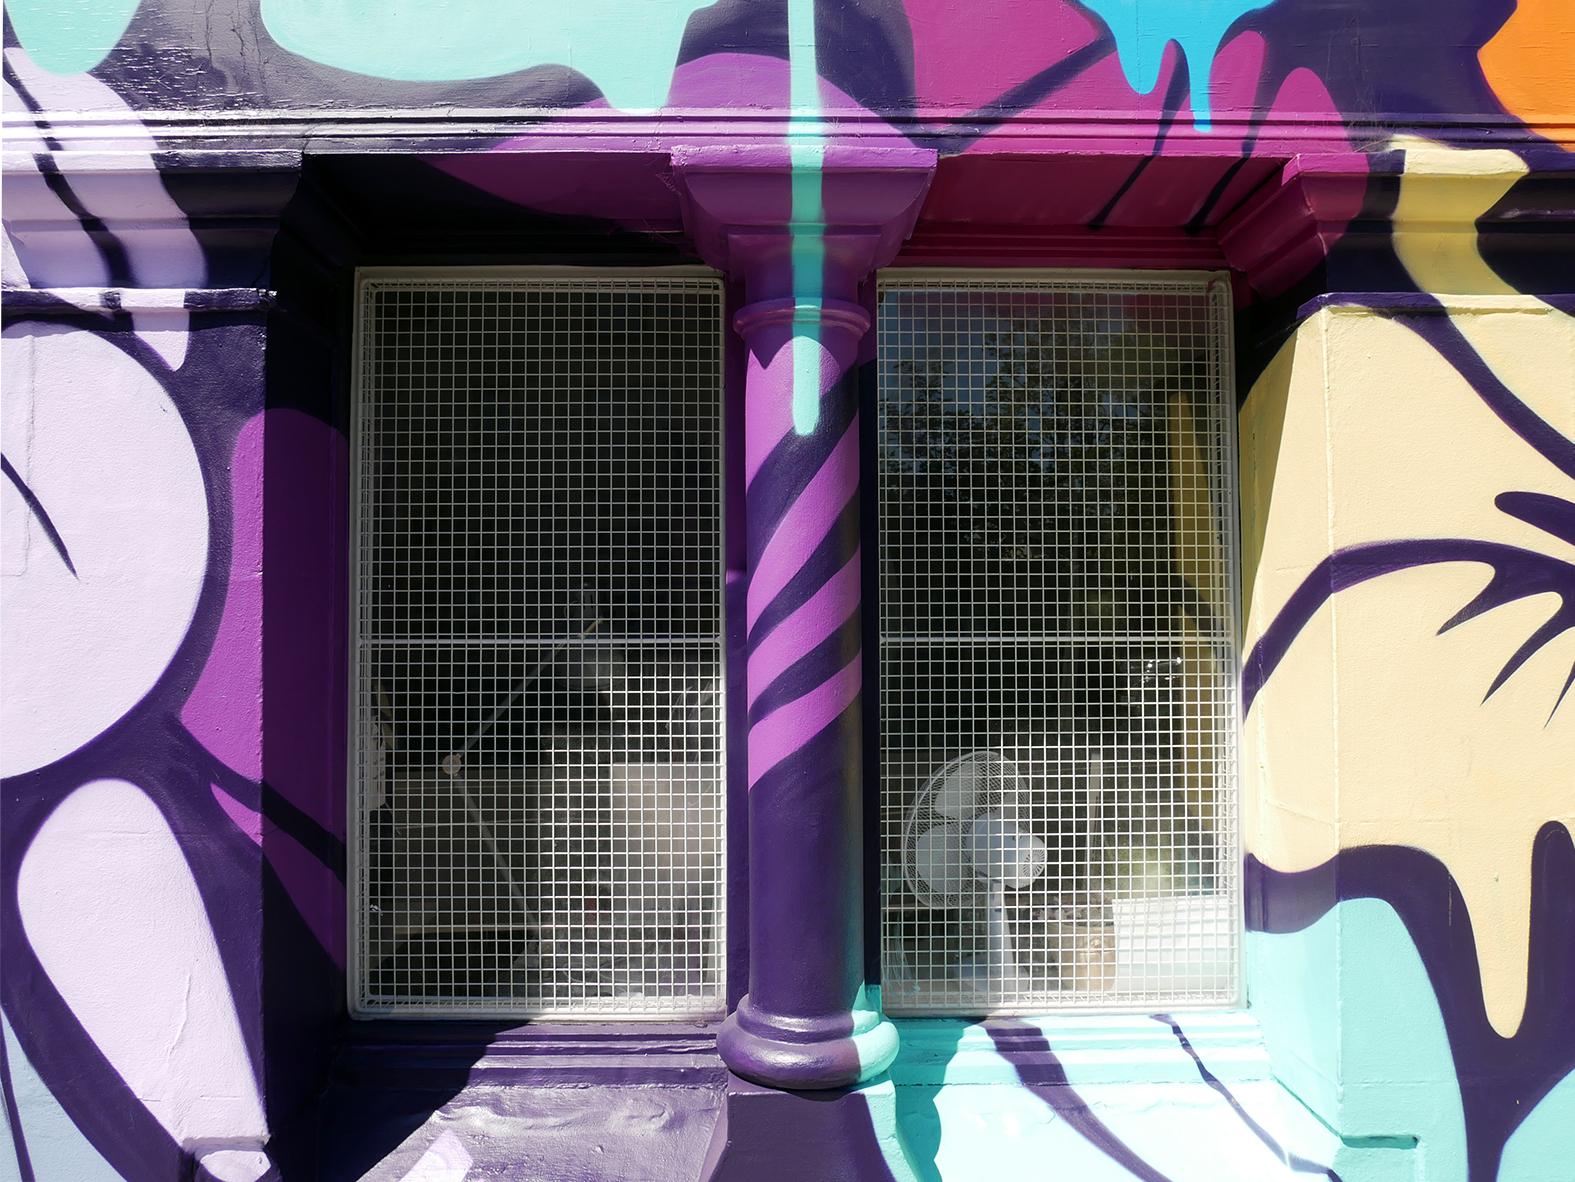 Nerone-olly-gallery-street-art-2